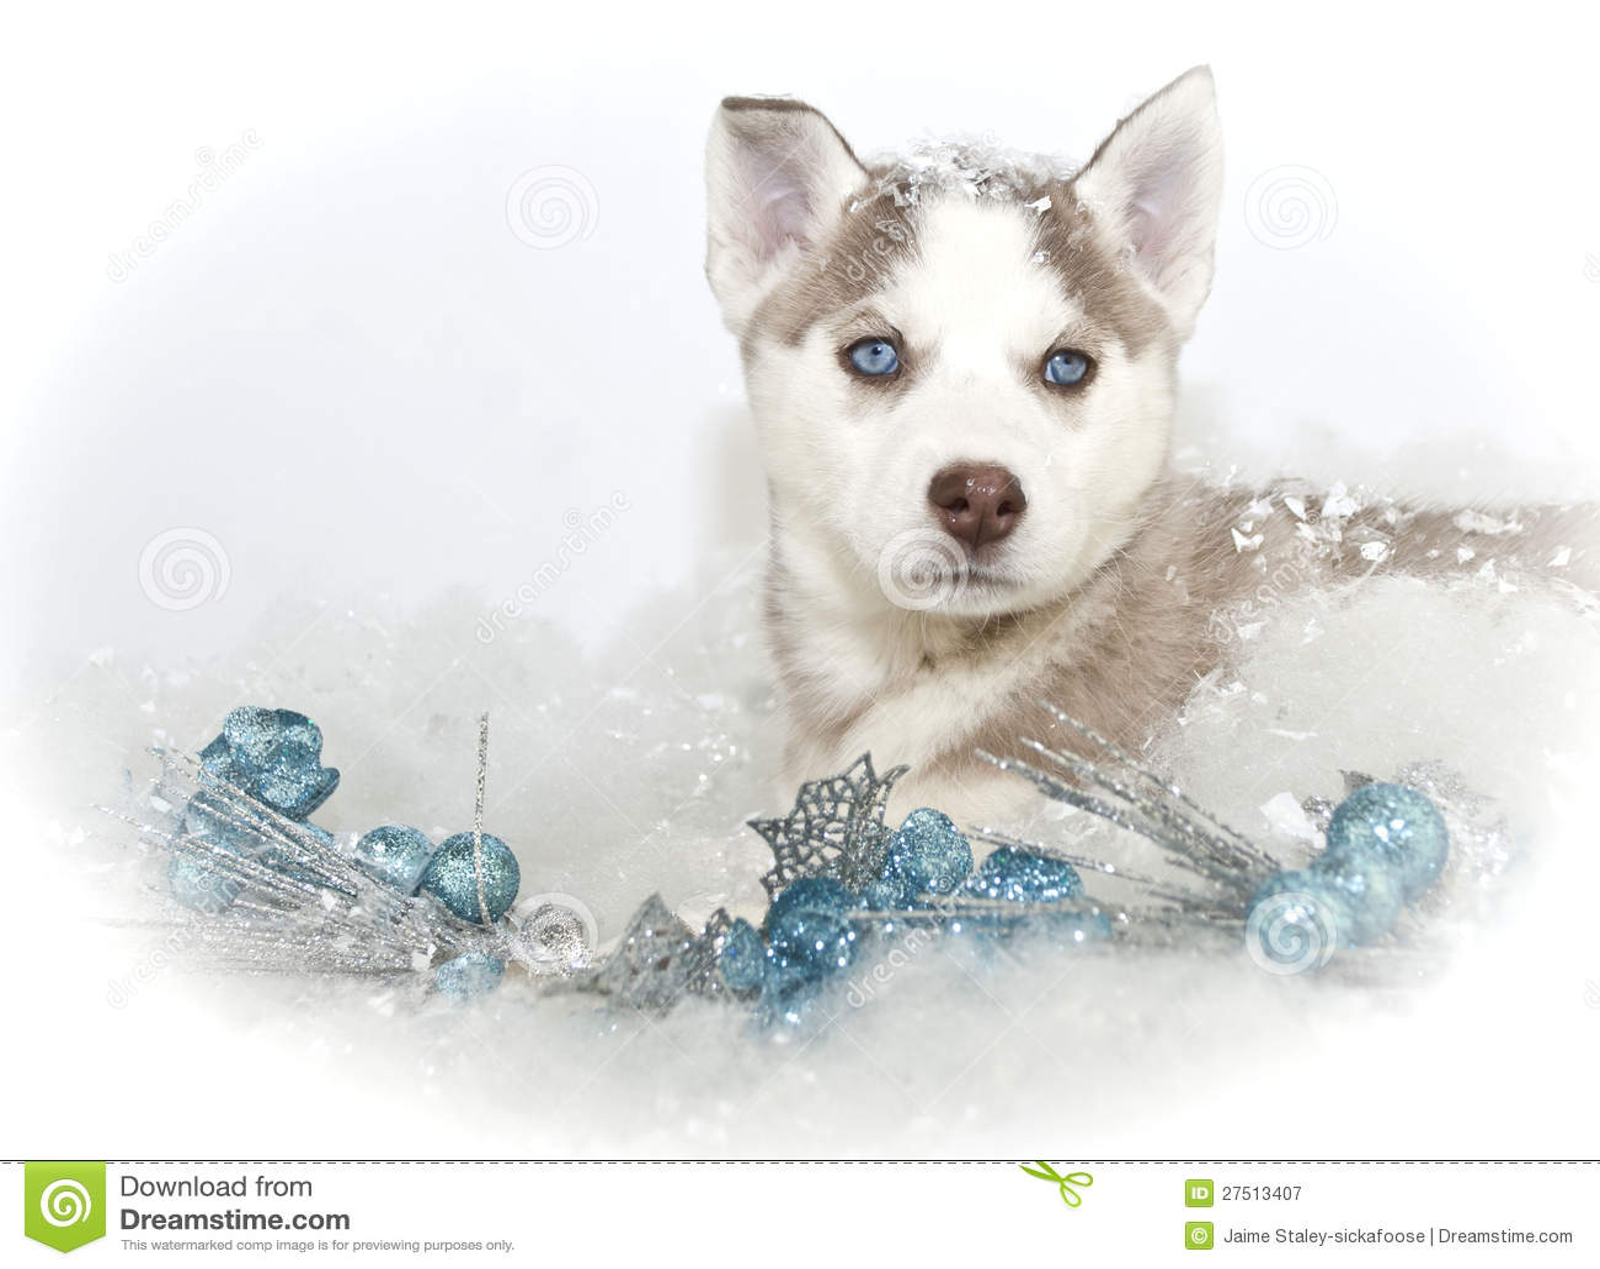 Husky Christmas Puppy.Beautiful Christmas Husky Puppy Stock Image Image Of Snow